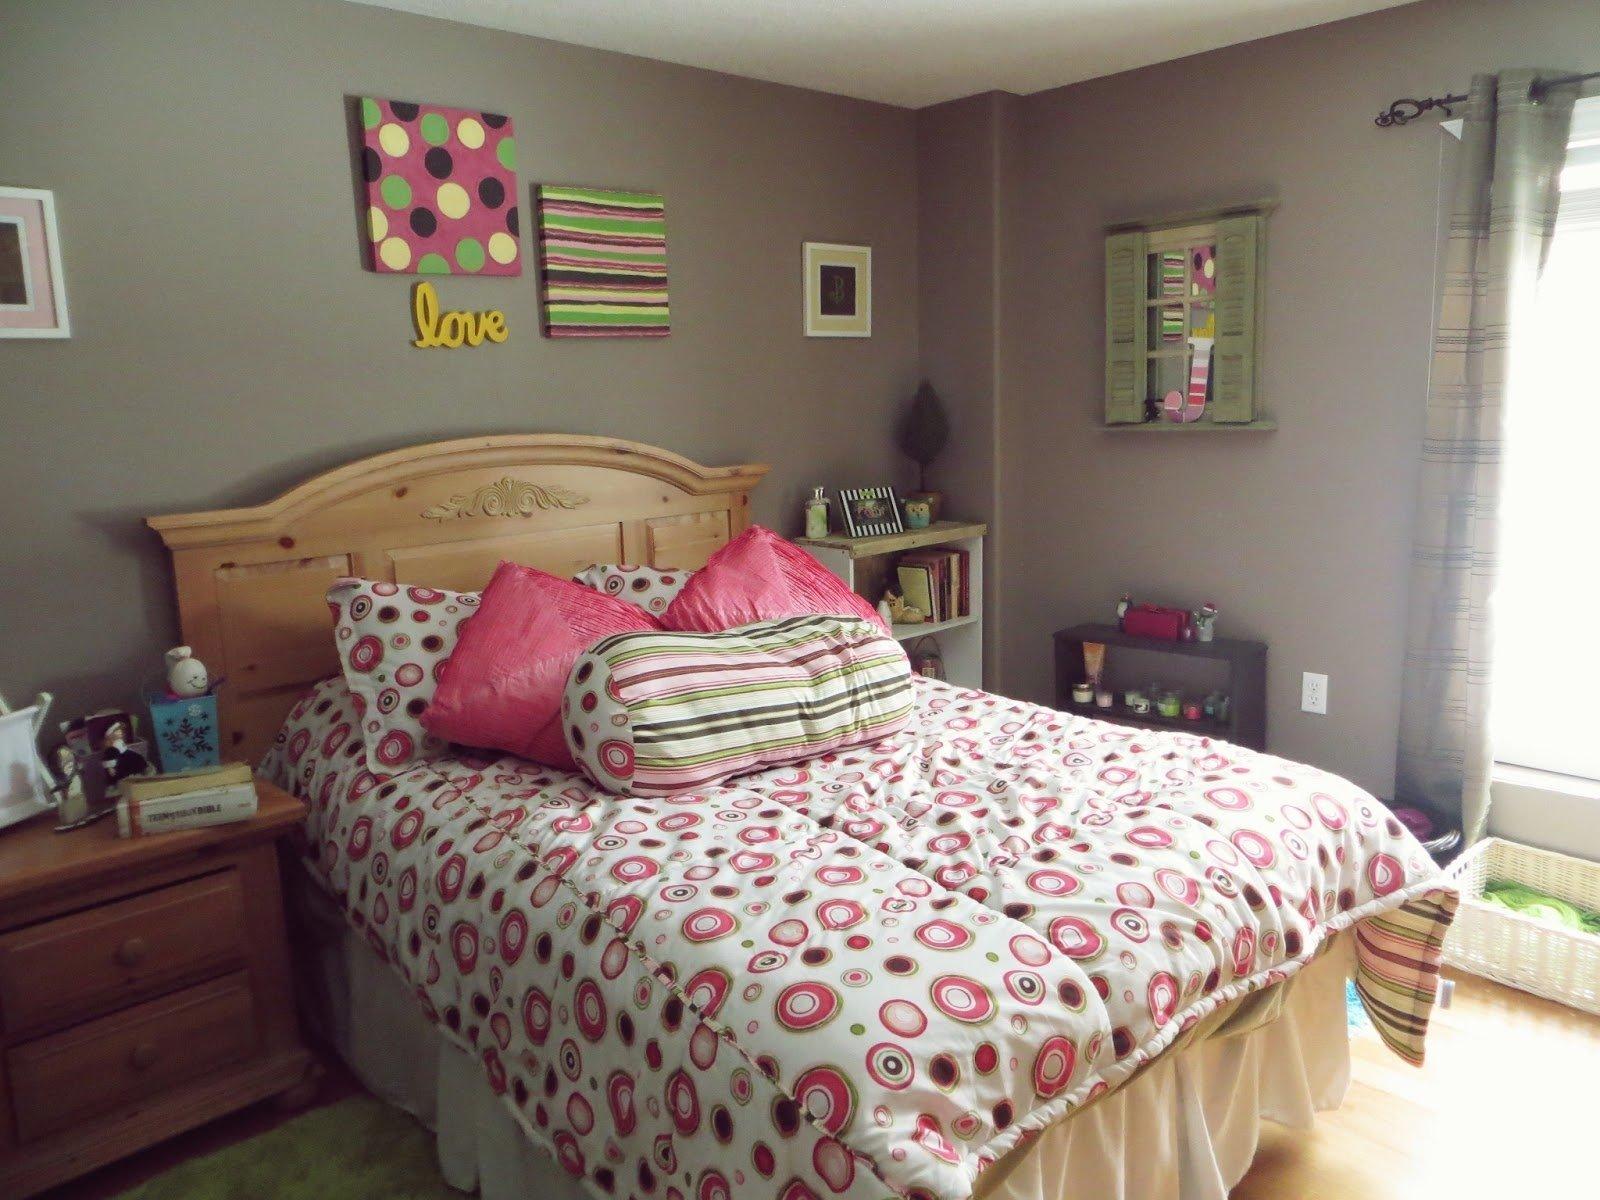 10 Stylish Teenage Girl Bedroom Decorating Ideas fresh decorating bedroom for teenage girl best gallery design ideas 2020